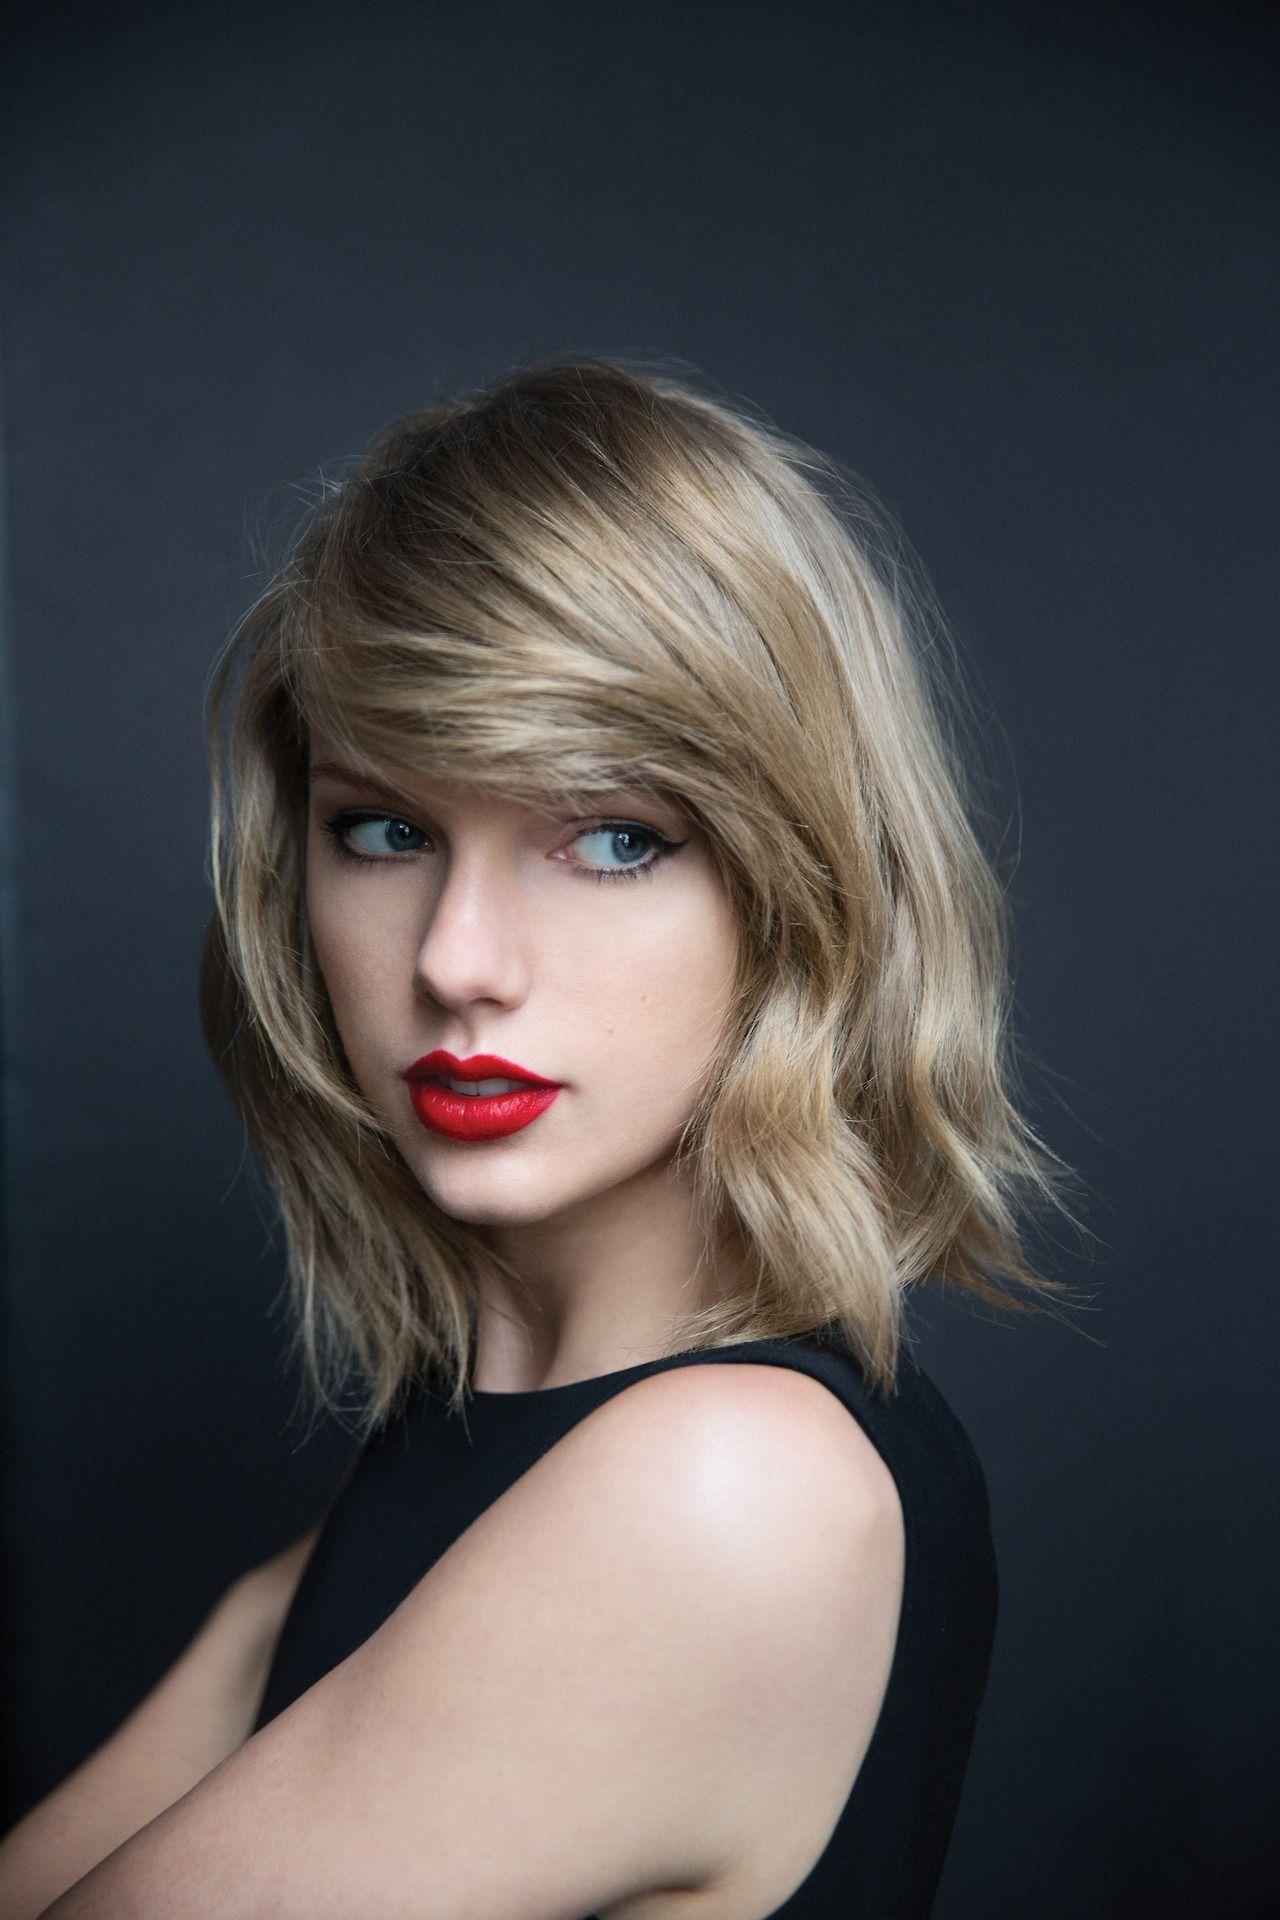 Taylor Swift Photoshoot Tumblr Taylor Swift In 2018 Pinterest